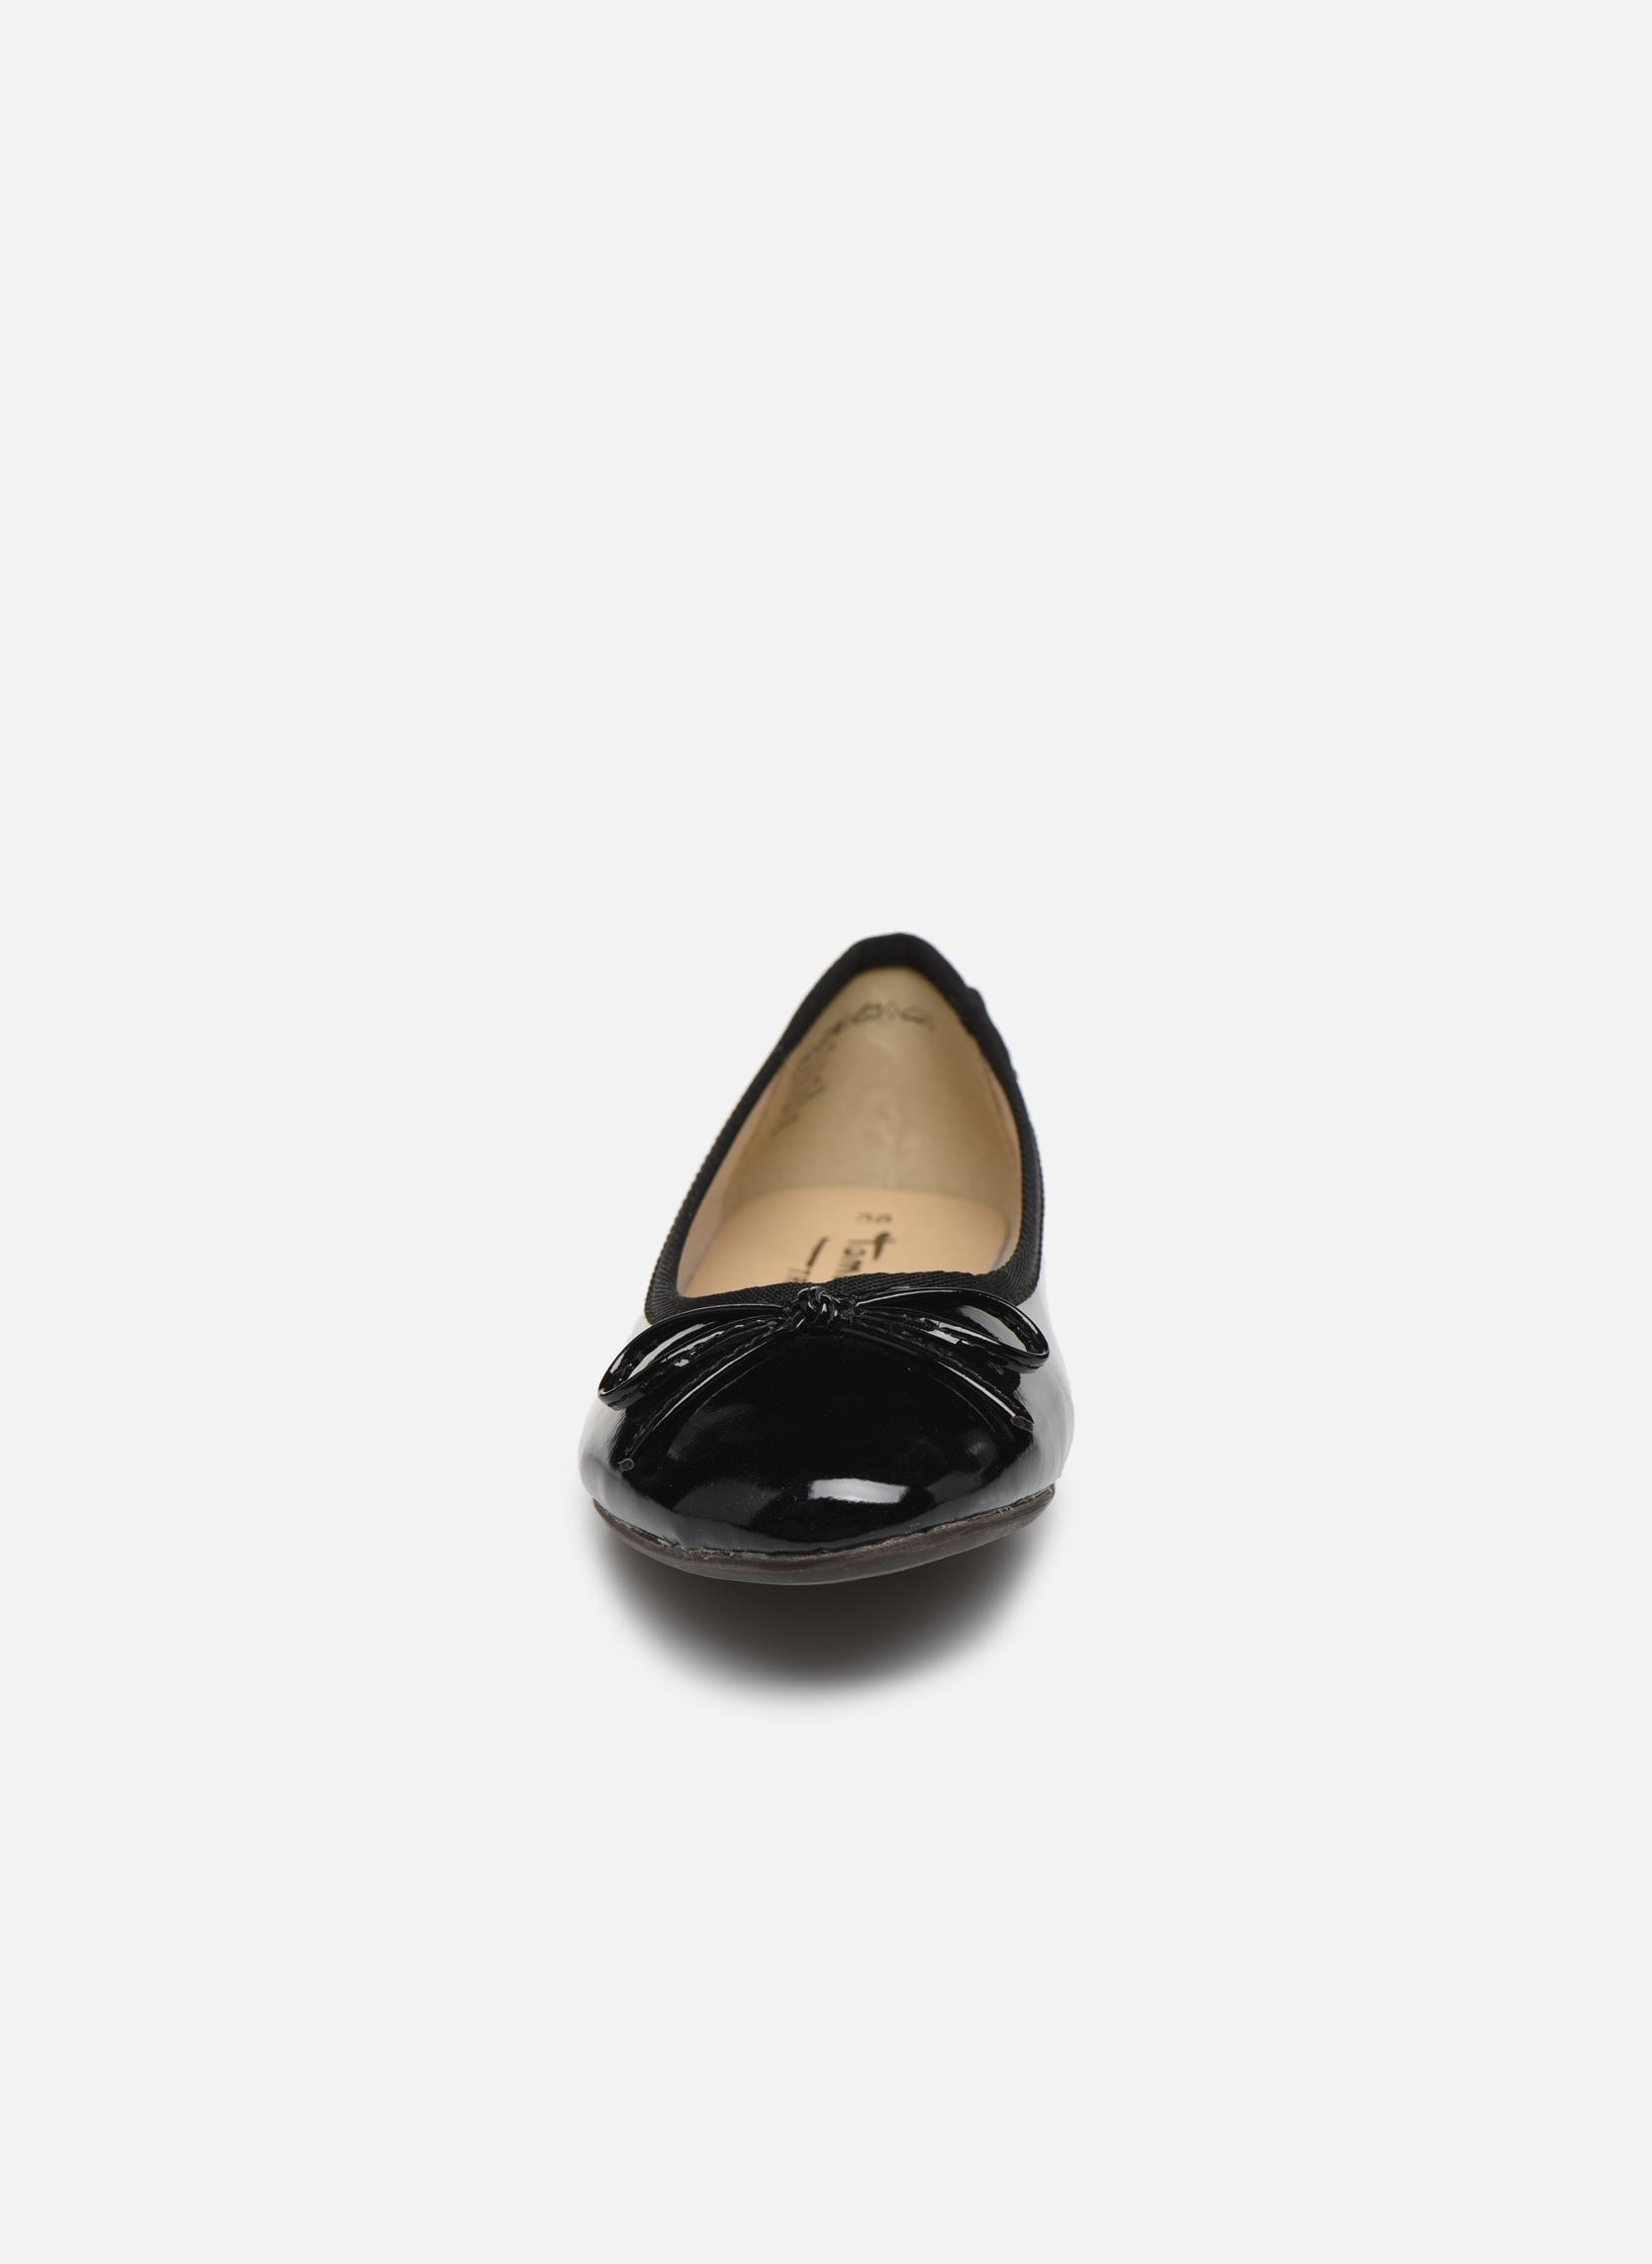 Lotusa Black Patent